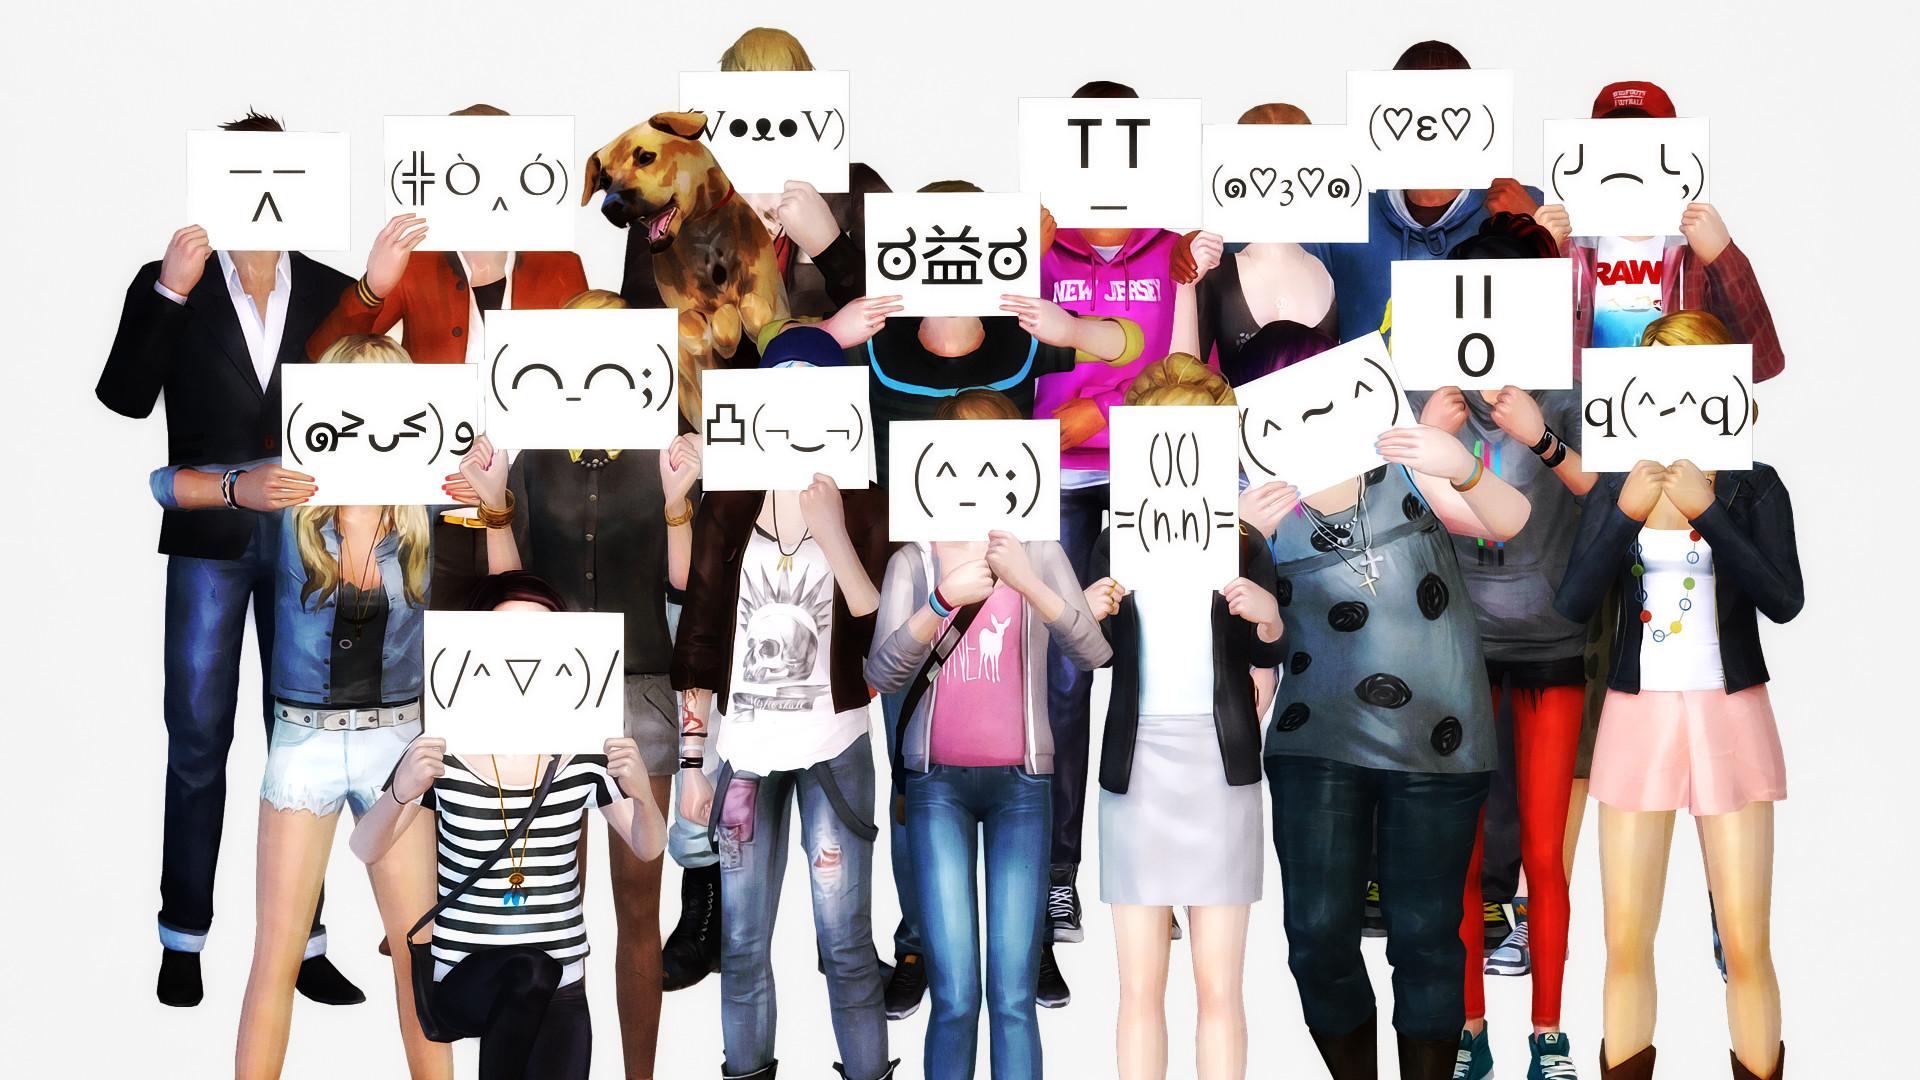 … life is strange emoji wallpaper by jinxonhog